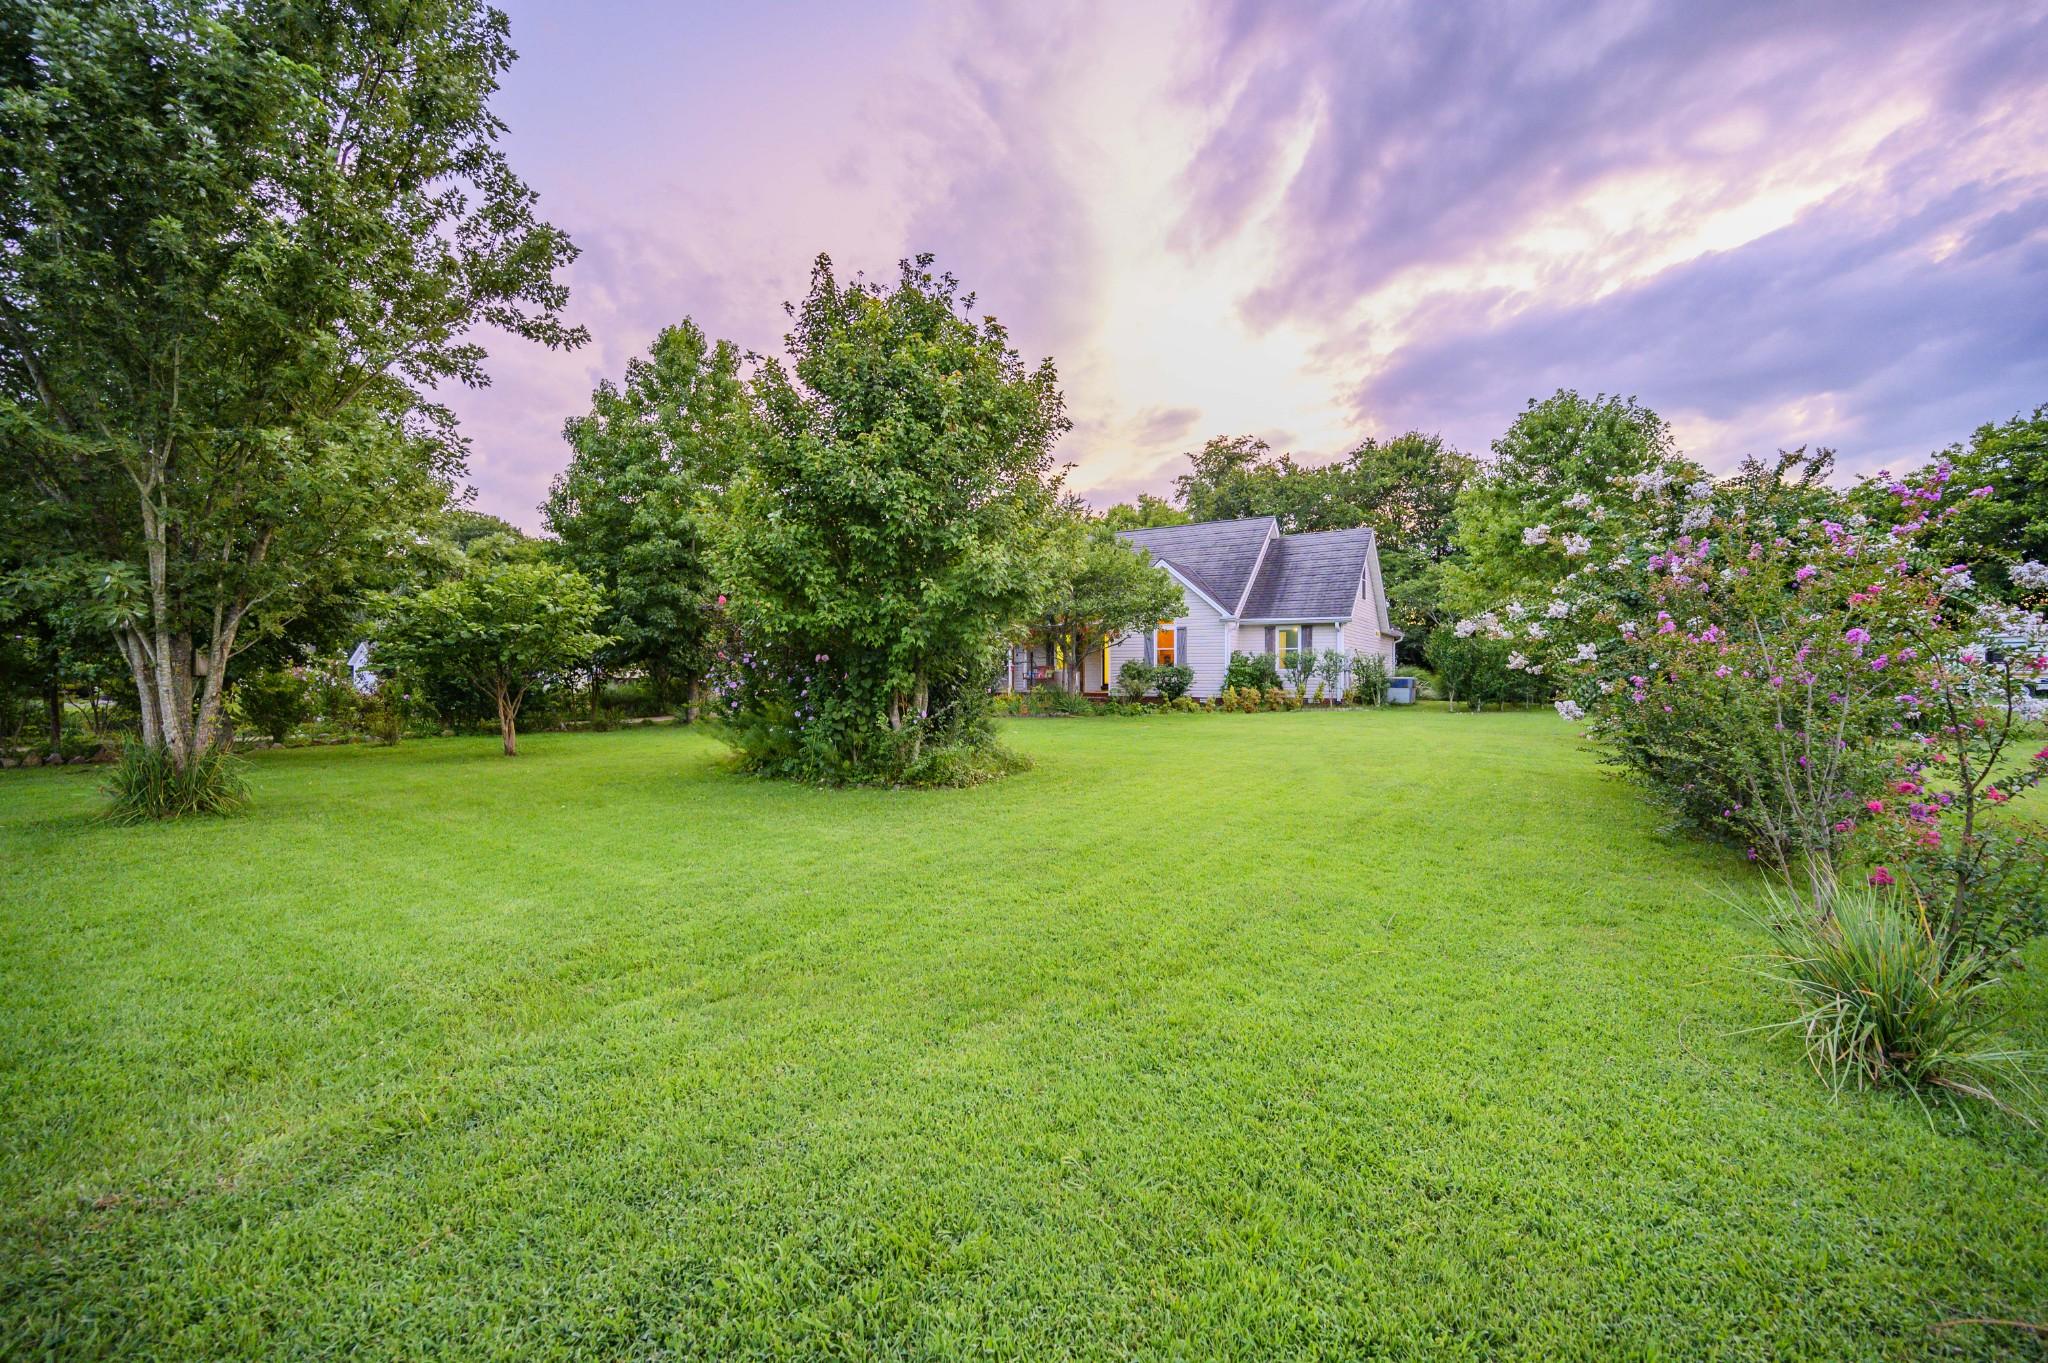 119 Remington Dr Property Photo - Lascassas, TN real estate listing